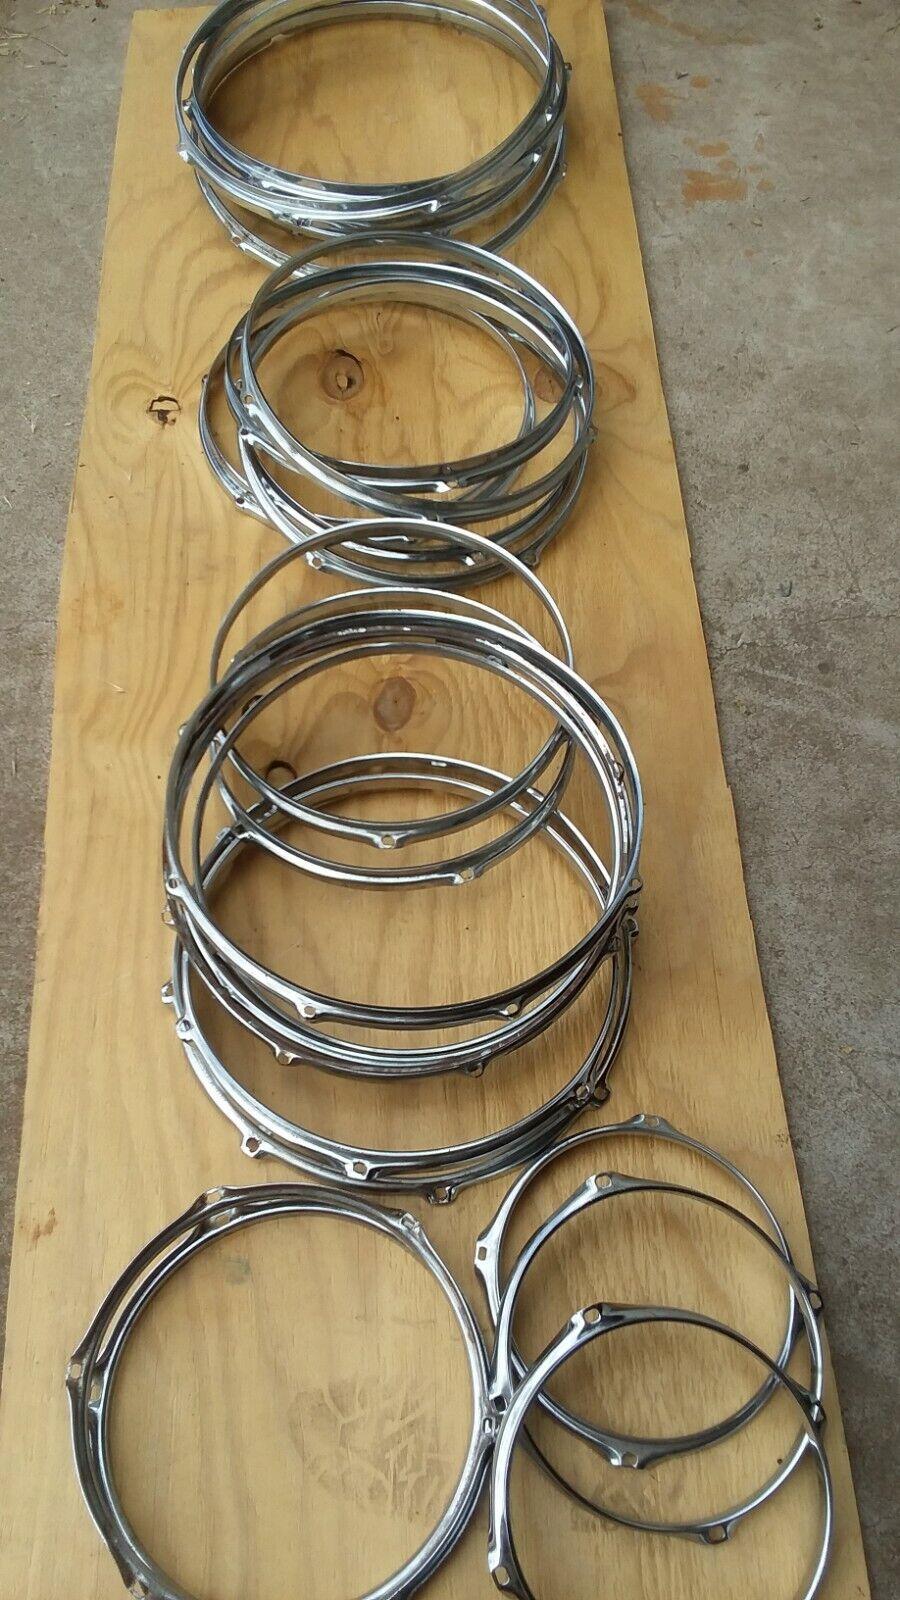 2 14 Snare Hoops / Rims. 6 Holes. 1 Set. Top Bottom. - $36.00